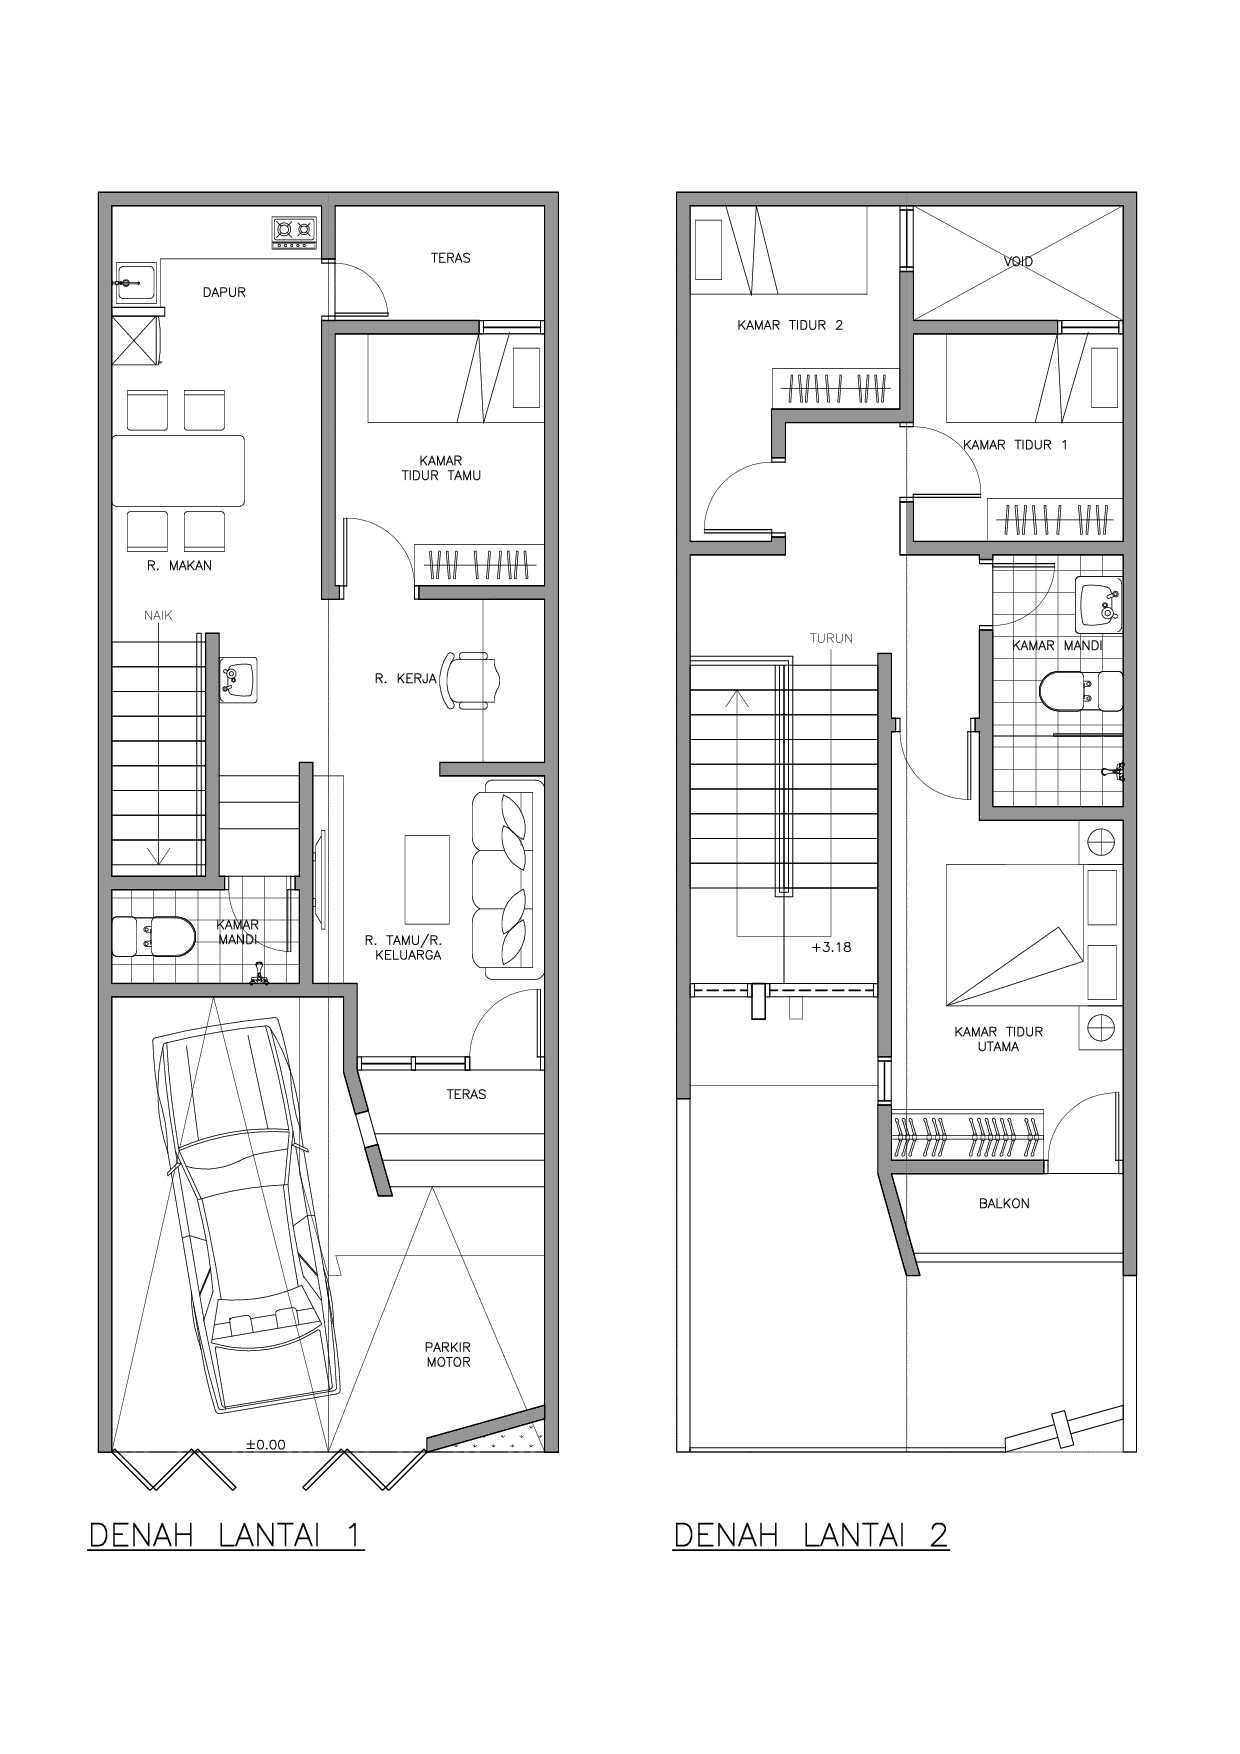 David Atmacendana Str P House Rawa Kepa 4, Tomang, West Jakarta Rawa Kepa 4, Tomang, West Jakarta Dtp-Fix-Model-1   18546